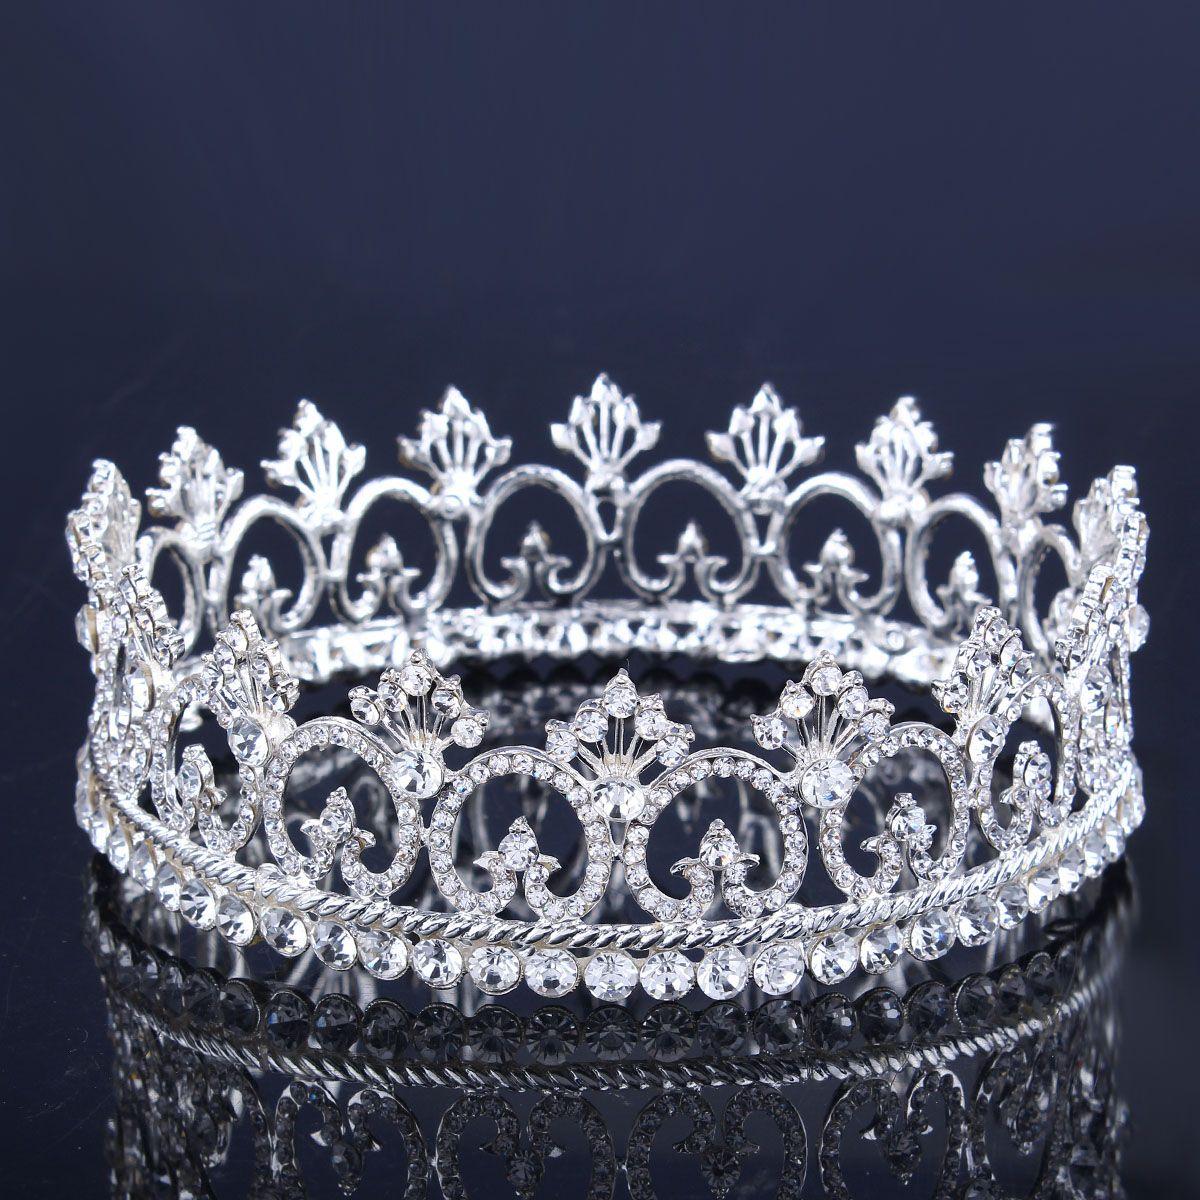 Crowns full circle round tiaras rhinestones crystal wedding bridal - Hot Rhinestone Crown Tiara Wedding Pageant Bridal Diamante Headpiece Jewelry